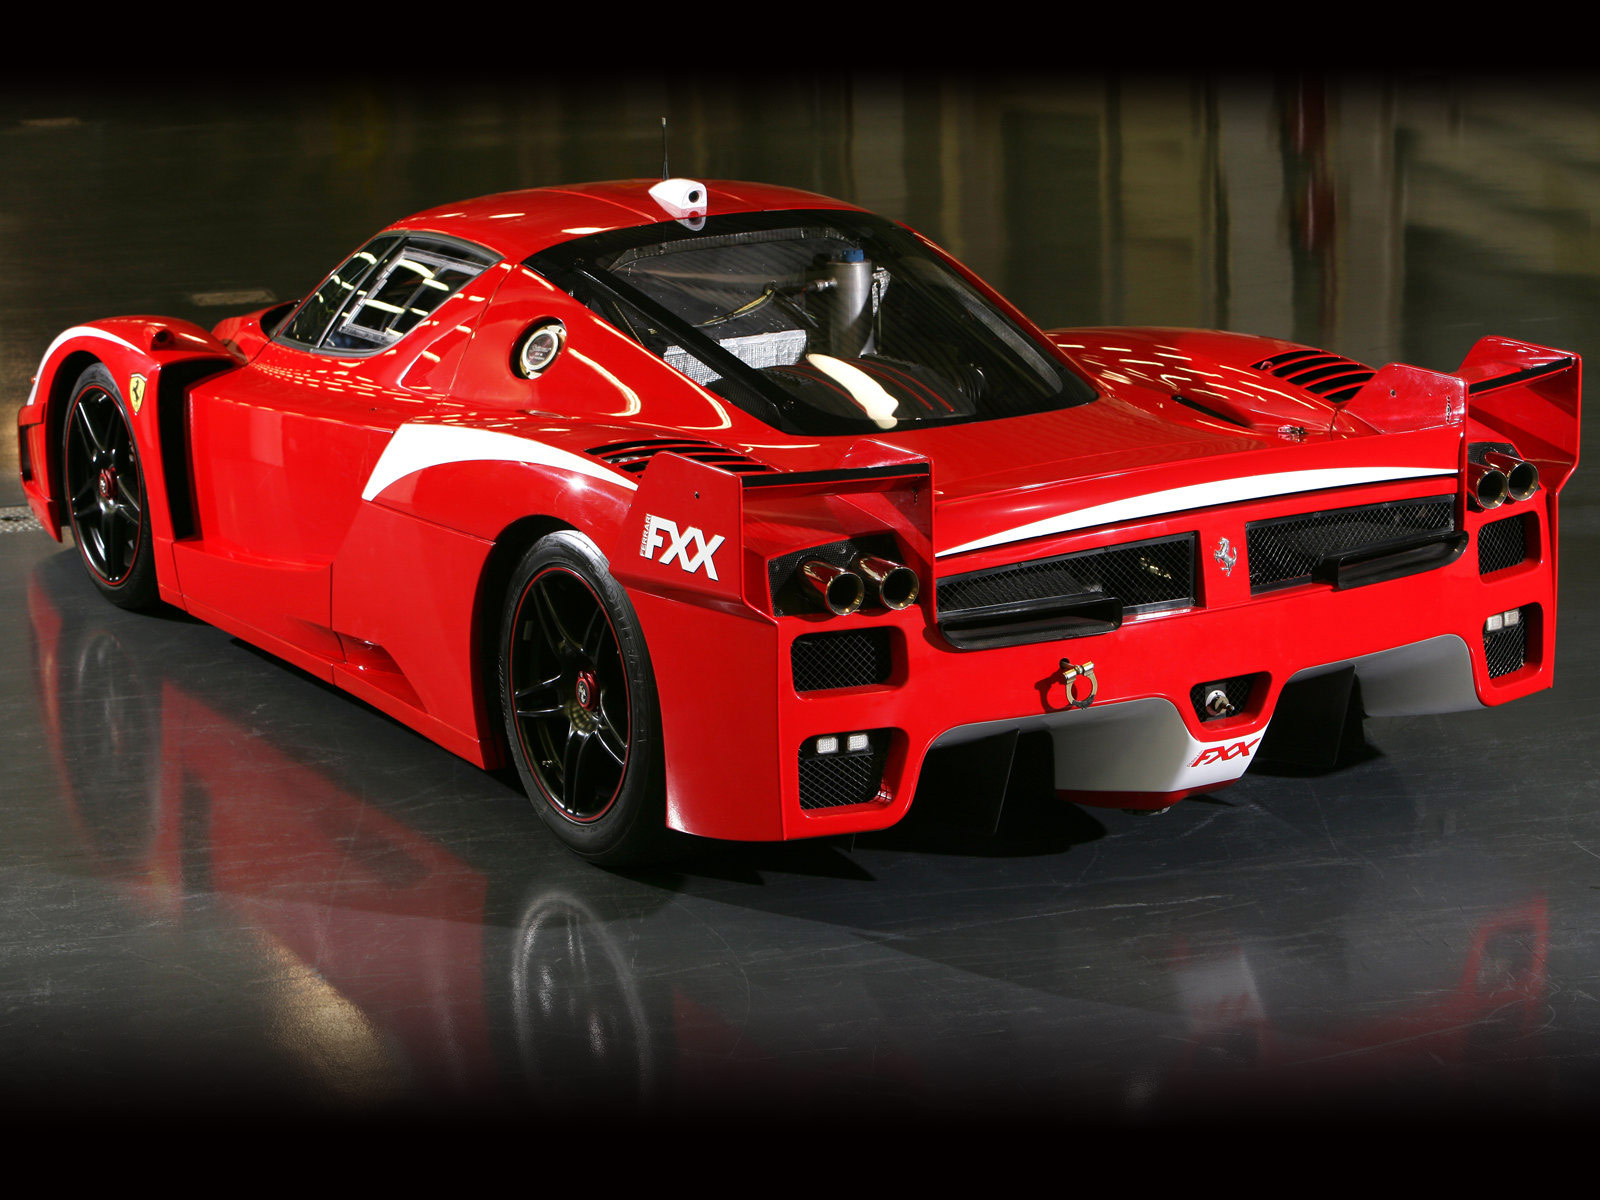 Gambar Mobil Ferrari Fxx Evolution 2008